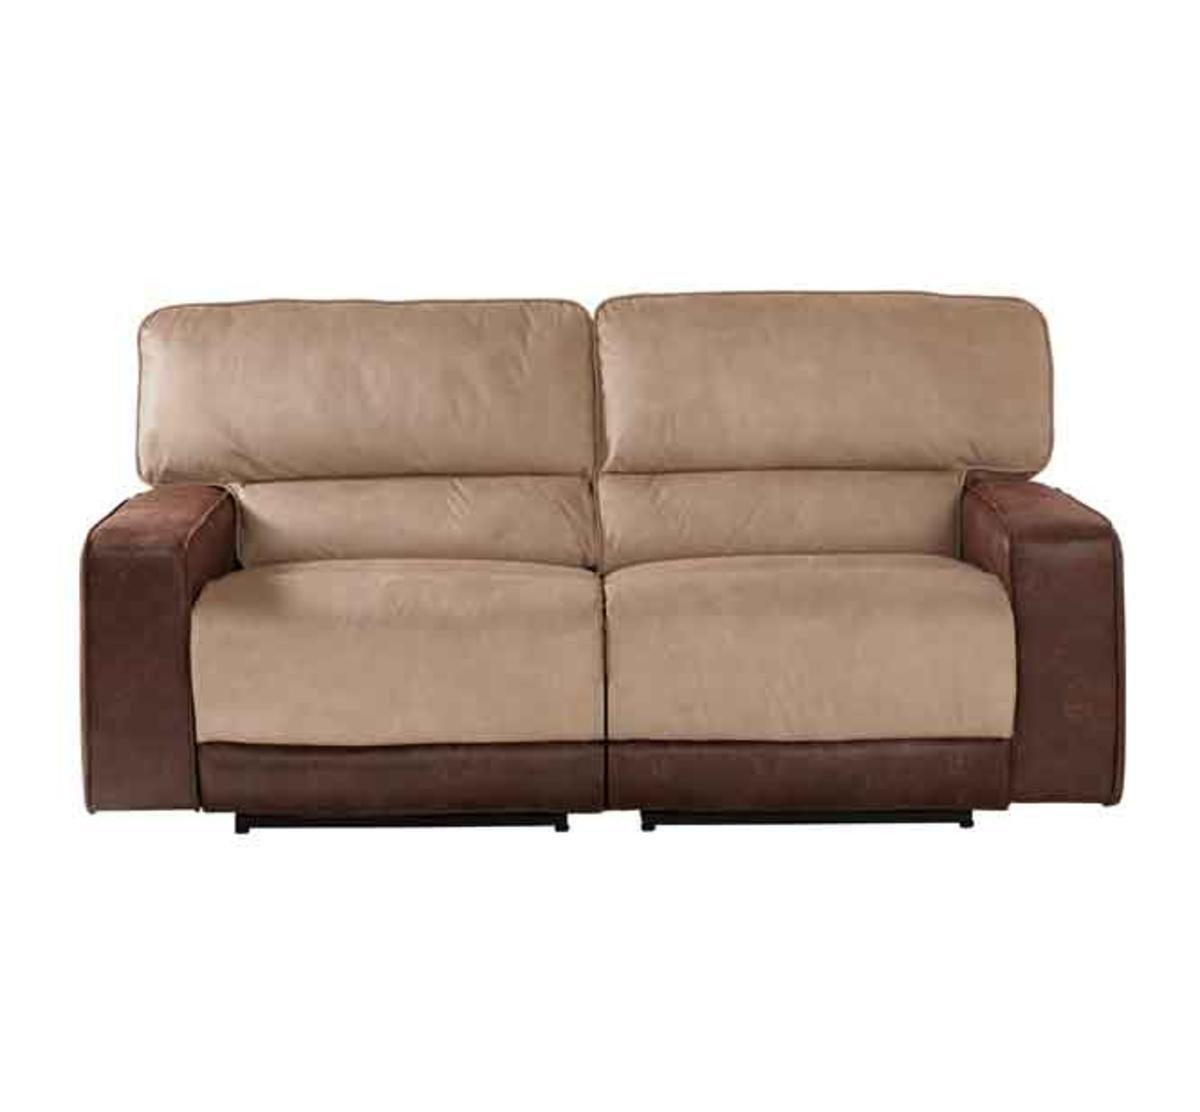 Superb Pasadena 2 Piece Reclining Loveseat Cjindustries Chair Design For Home Cjindustriesco